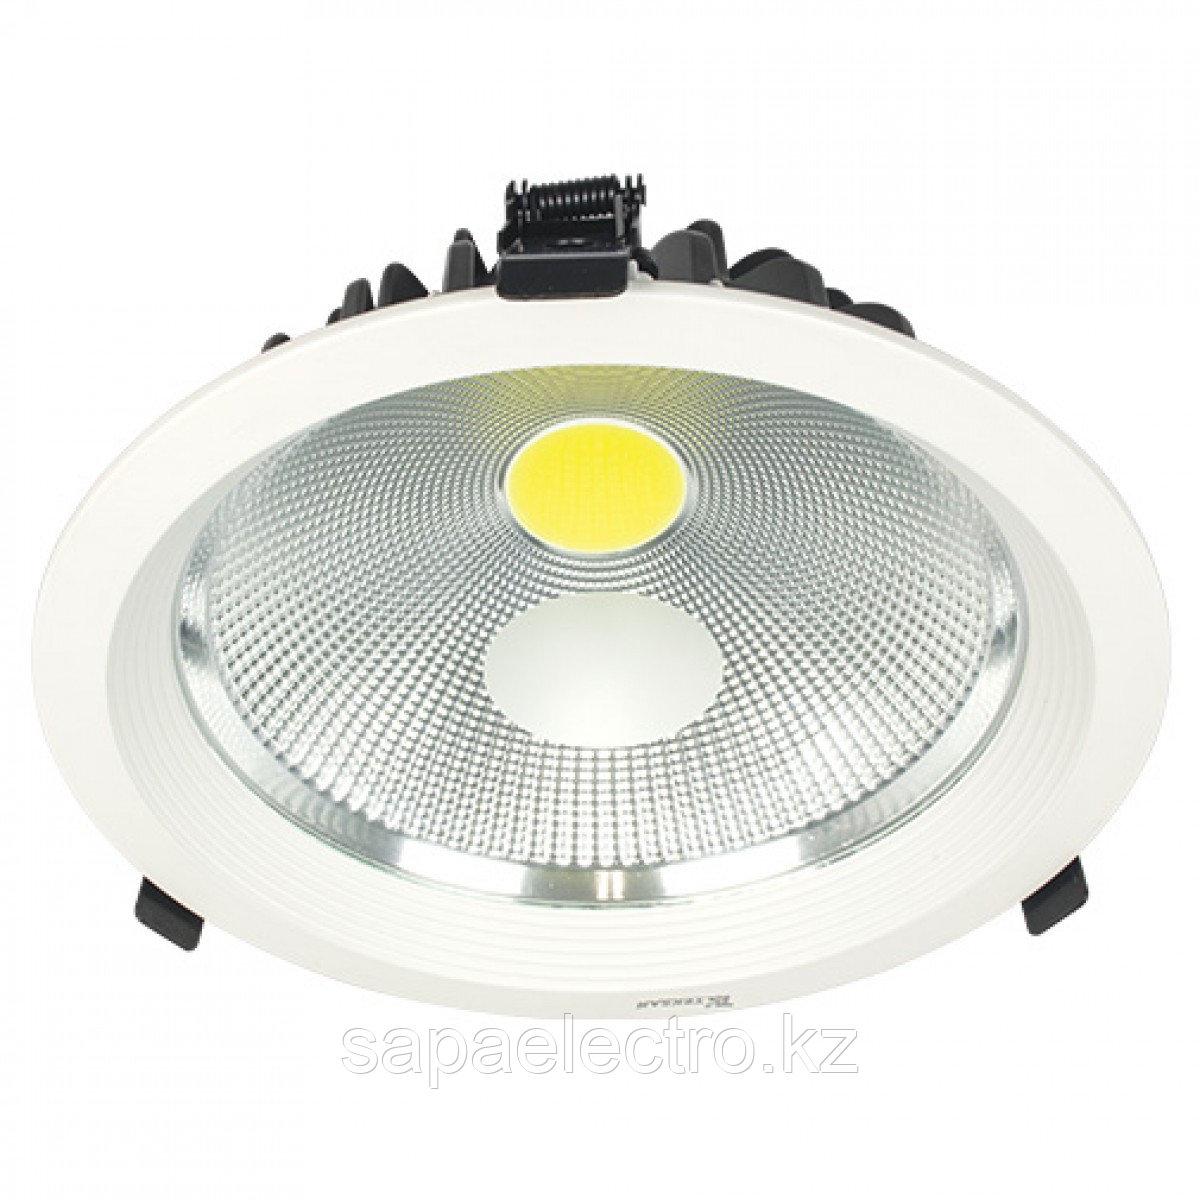 Свет-к DOWNLIGHT LED TD8101 30W 5000K (TEKSAN)24шт